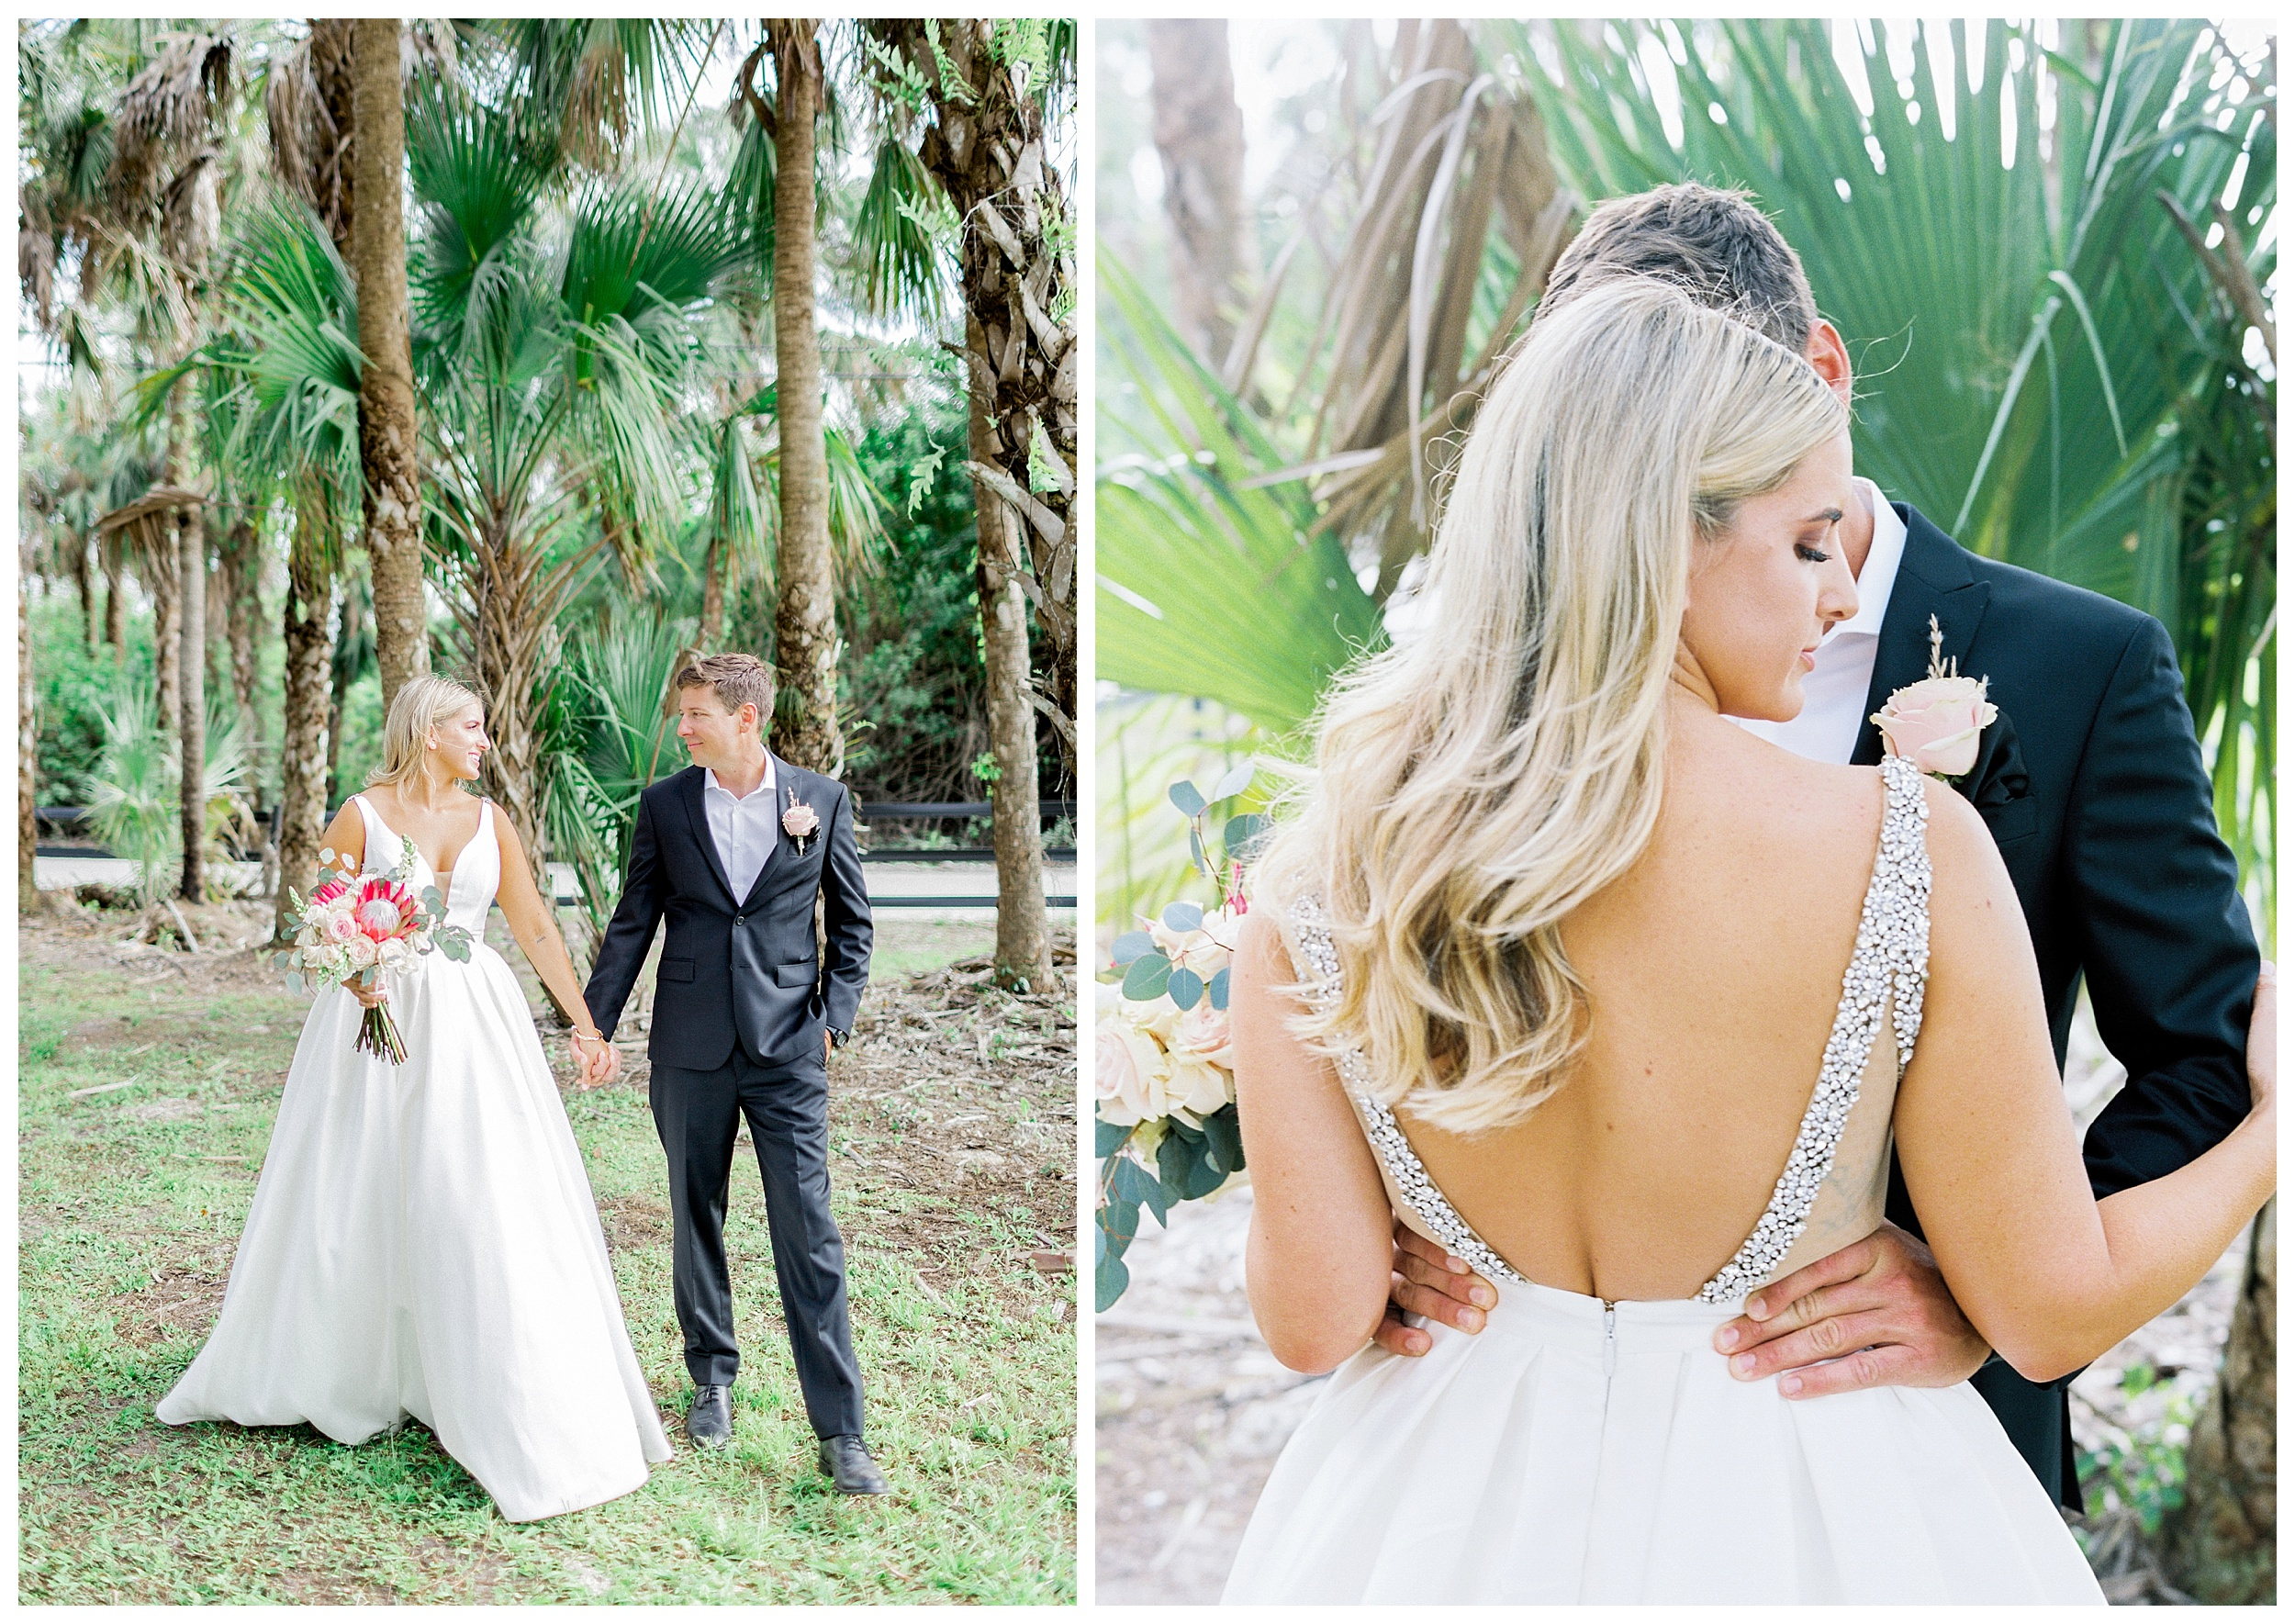 South Florida Wedding Photographer Kir Tuben_0035.jpg